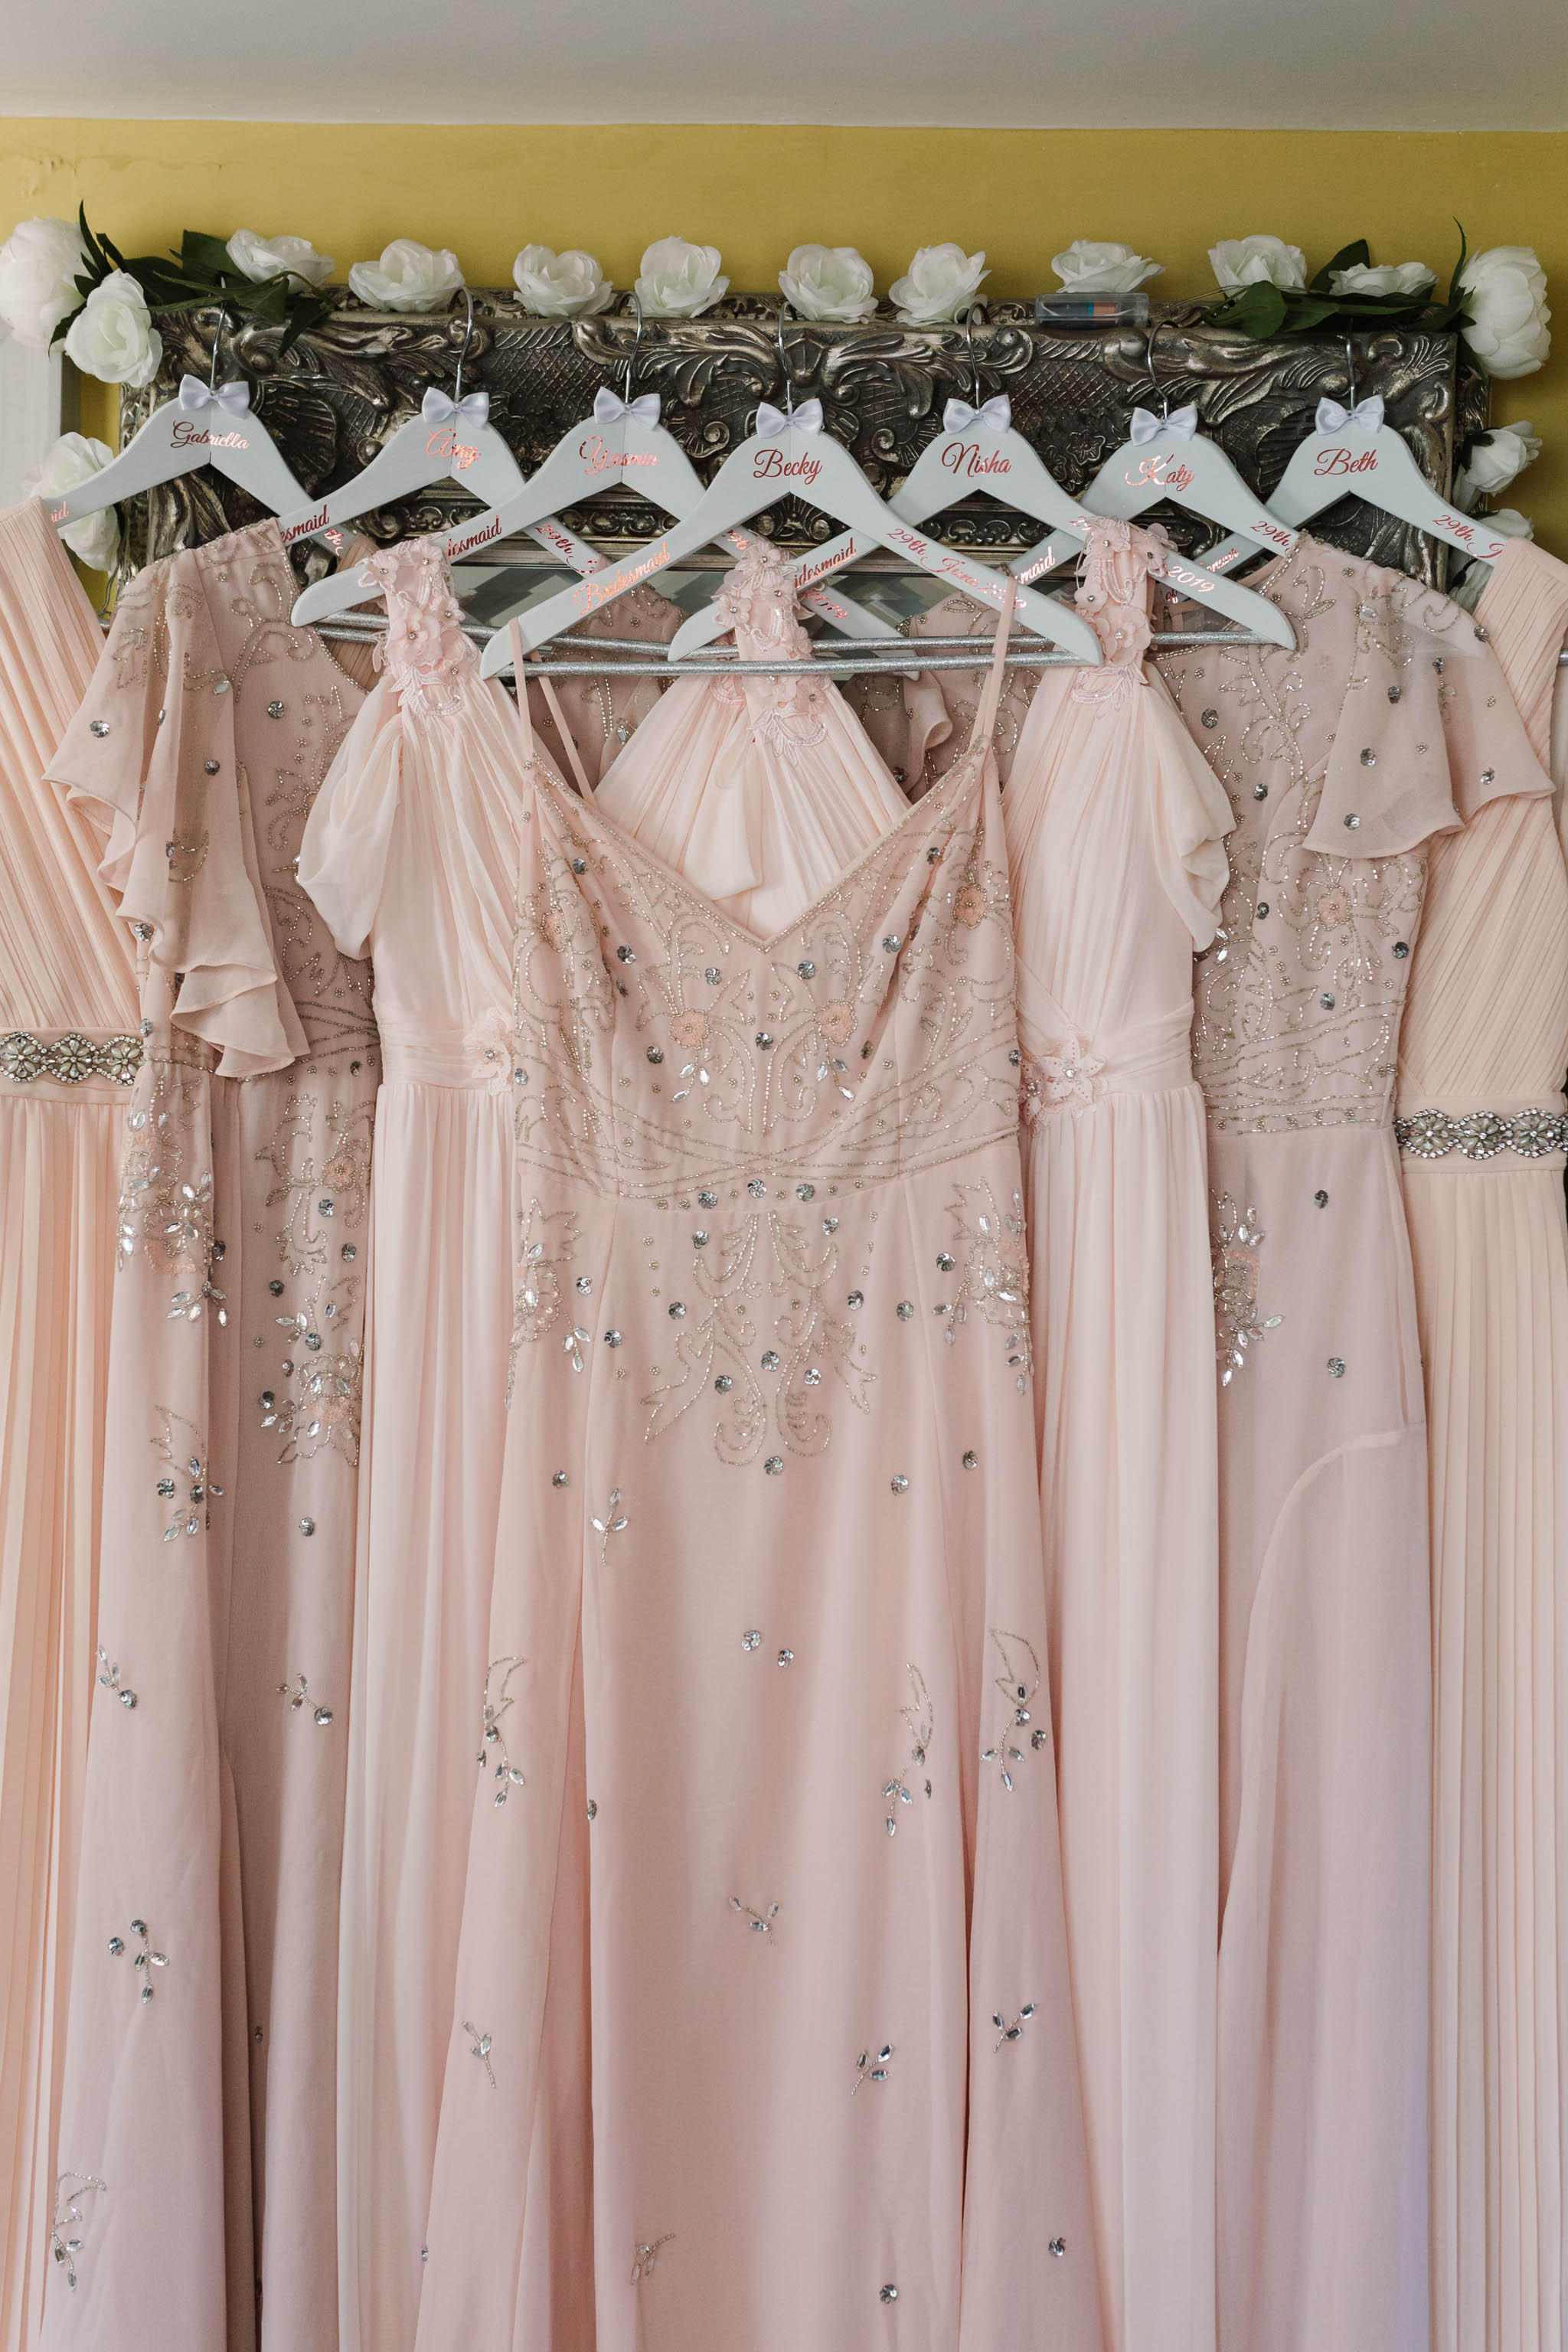 array of pink vintage bridesmaids dresses